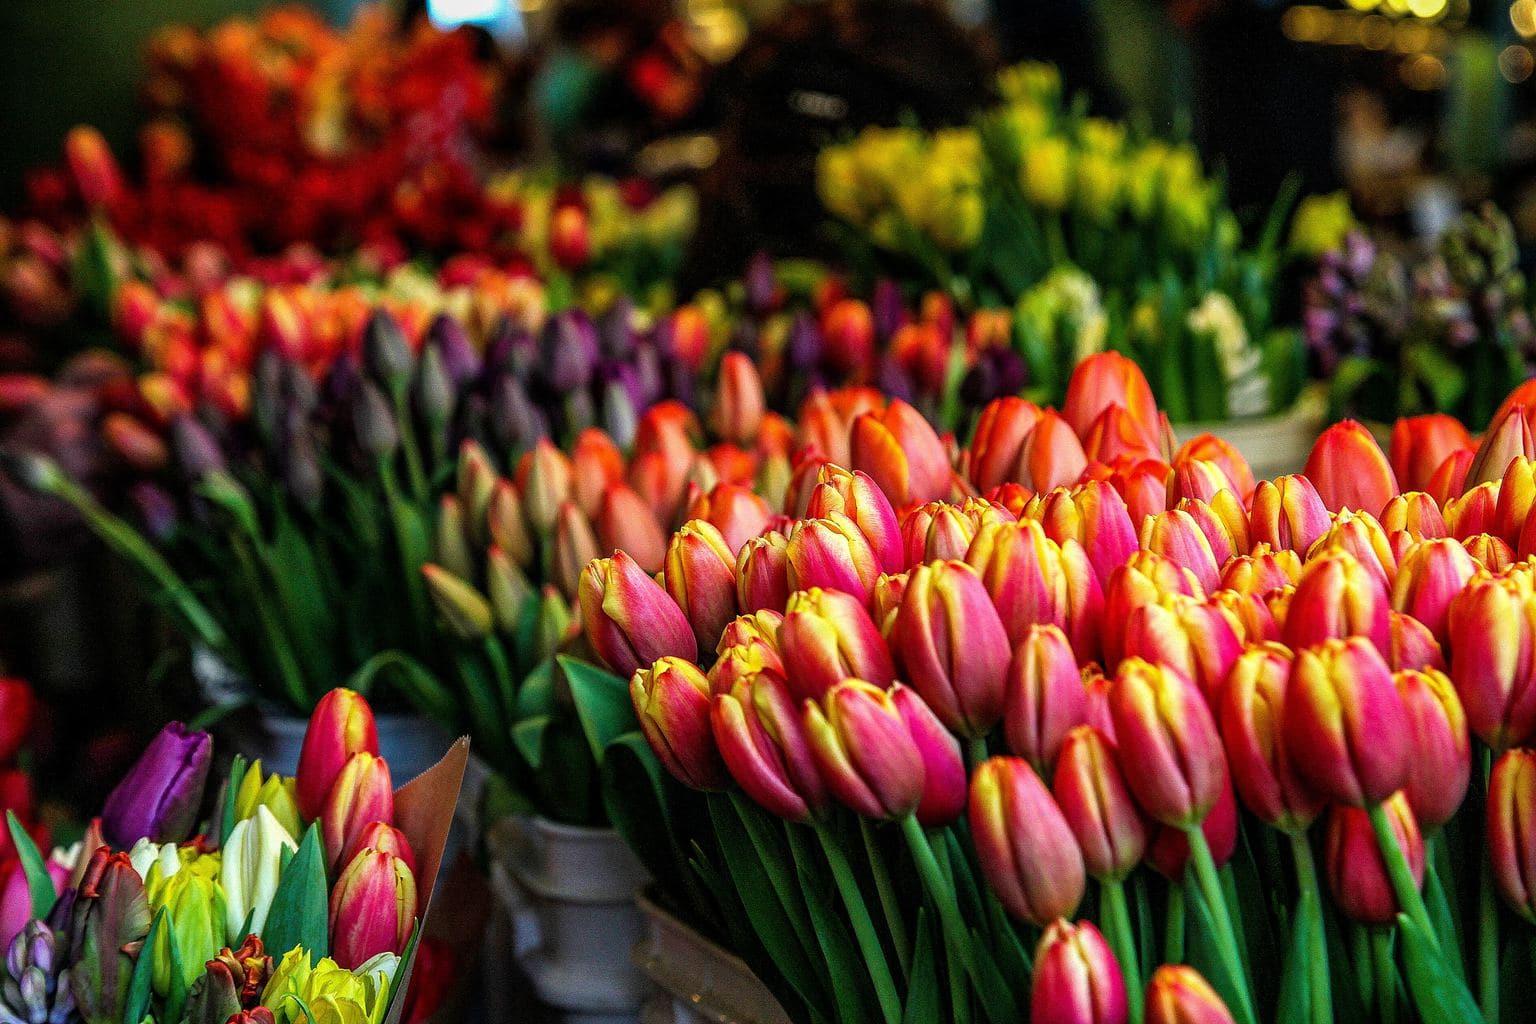 Tulips at Flower market, Utrecht